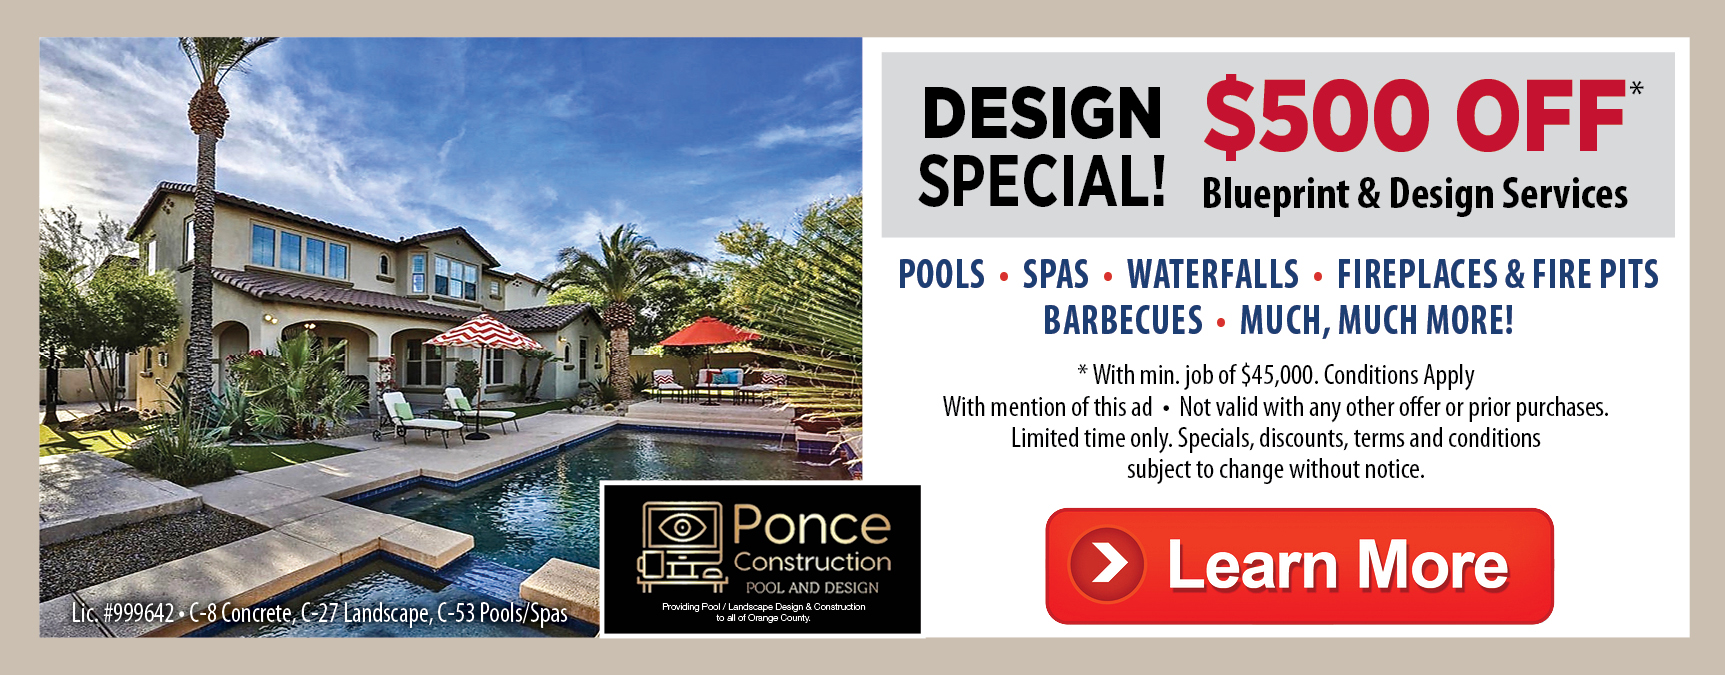 Ponce Construction_Offer_Reg_09-19.jpg